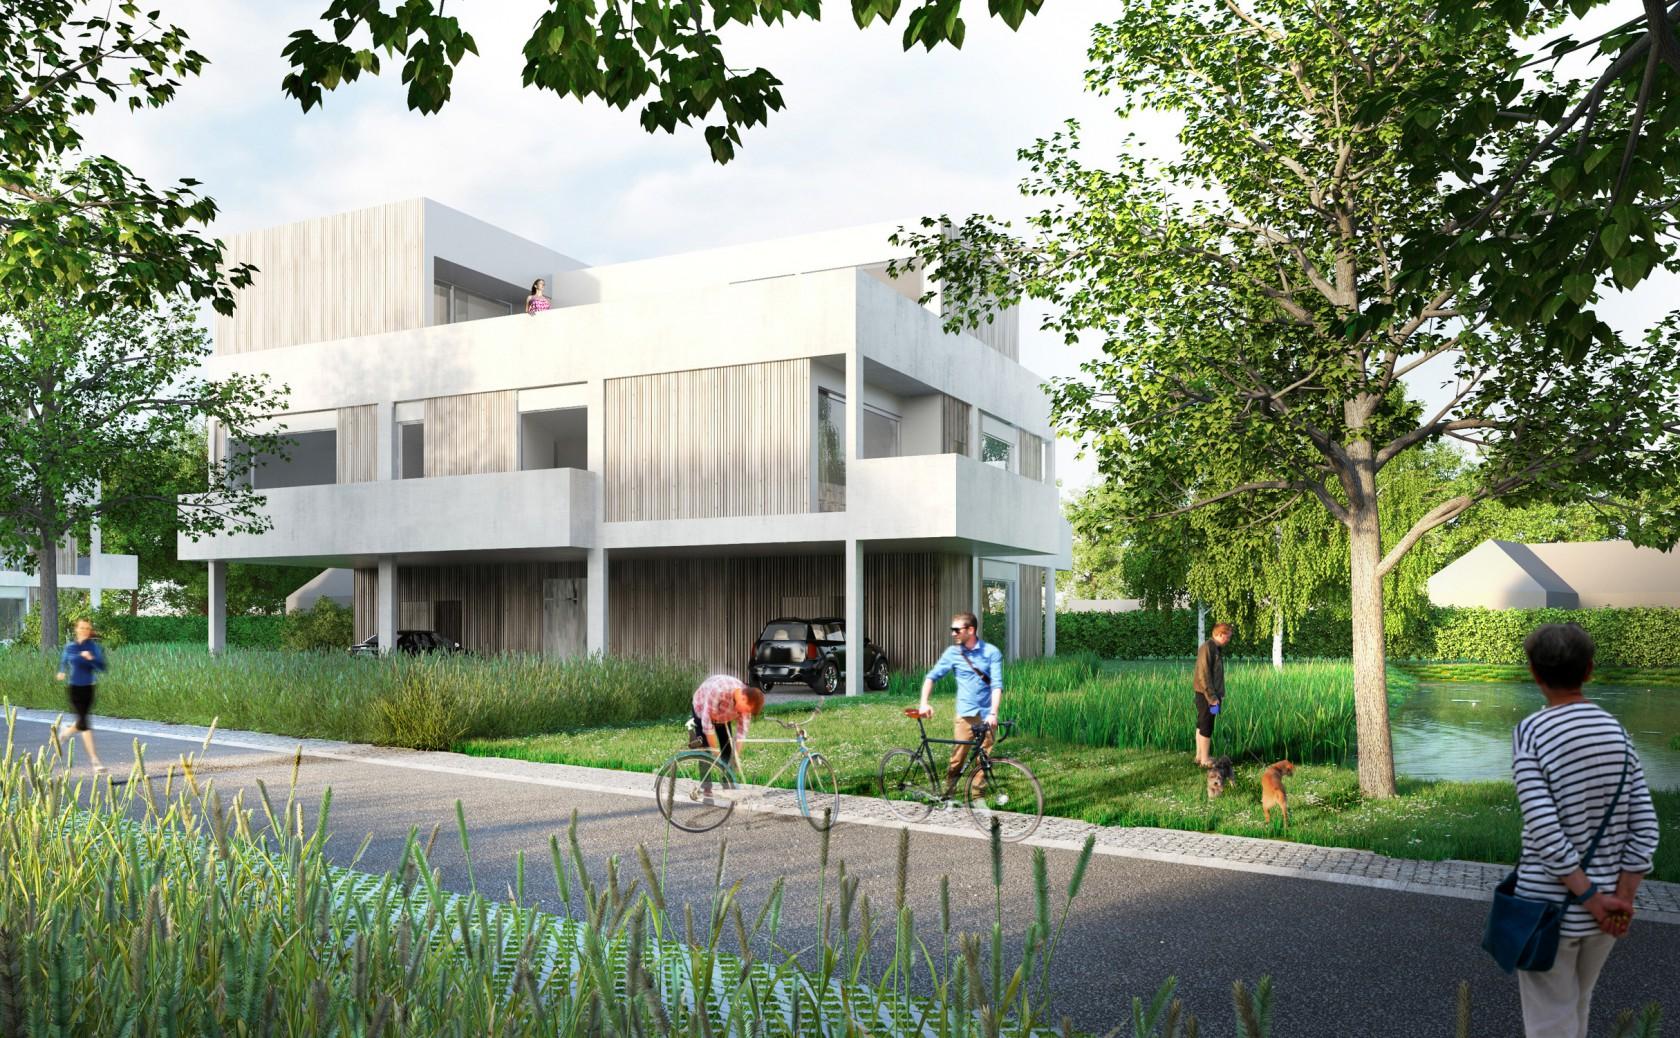 Abscis Architecten - urban villa in autoluwe omgeving - visualisatie Abscis Architecten